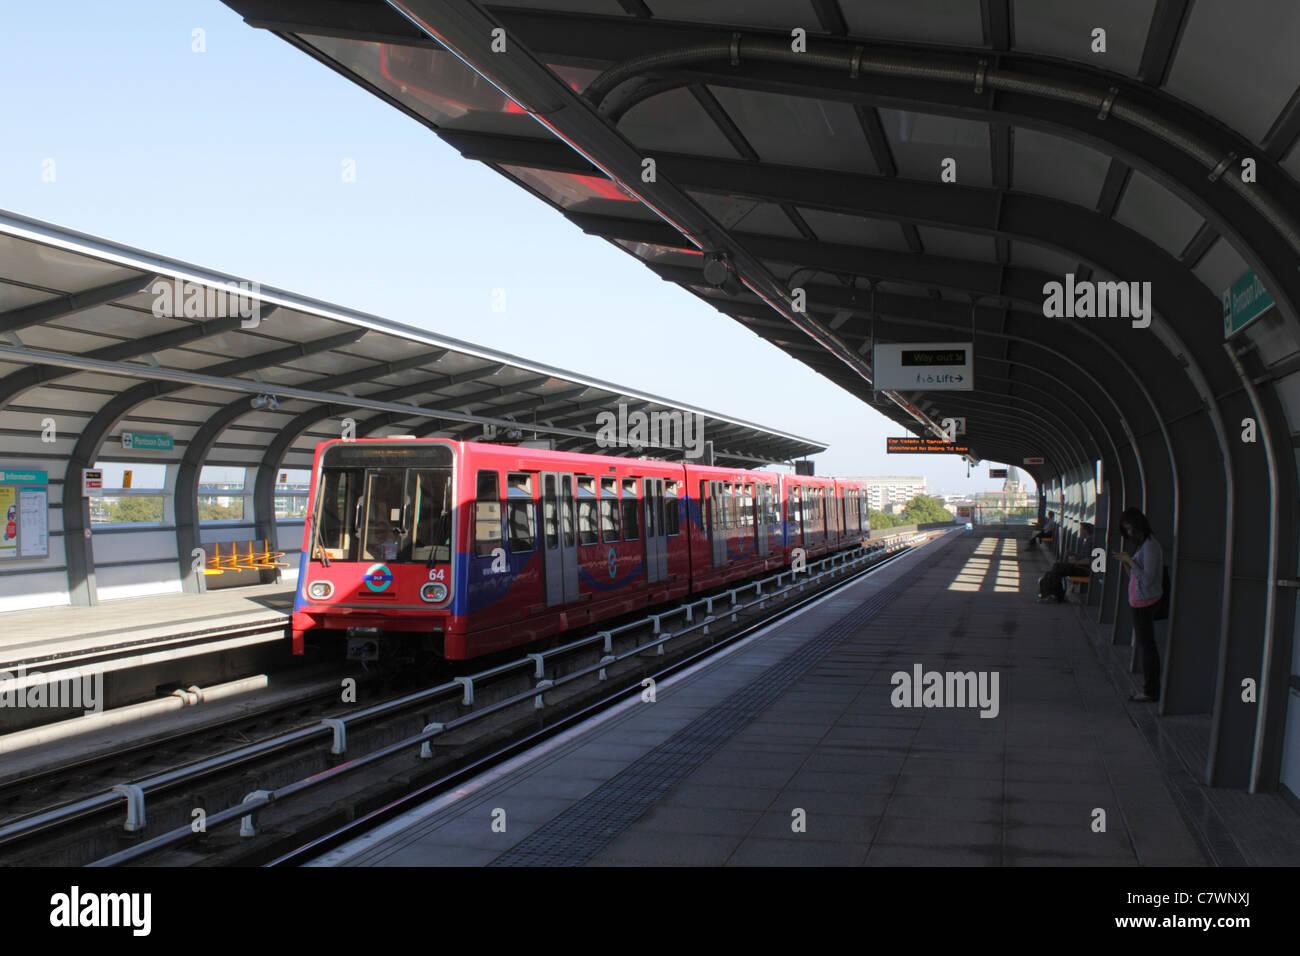 Docklands Light Railway train at Pontoon Dock Station London - Stock Image